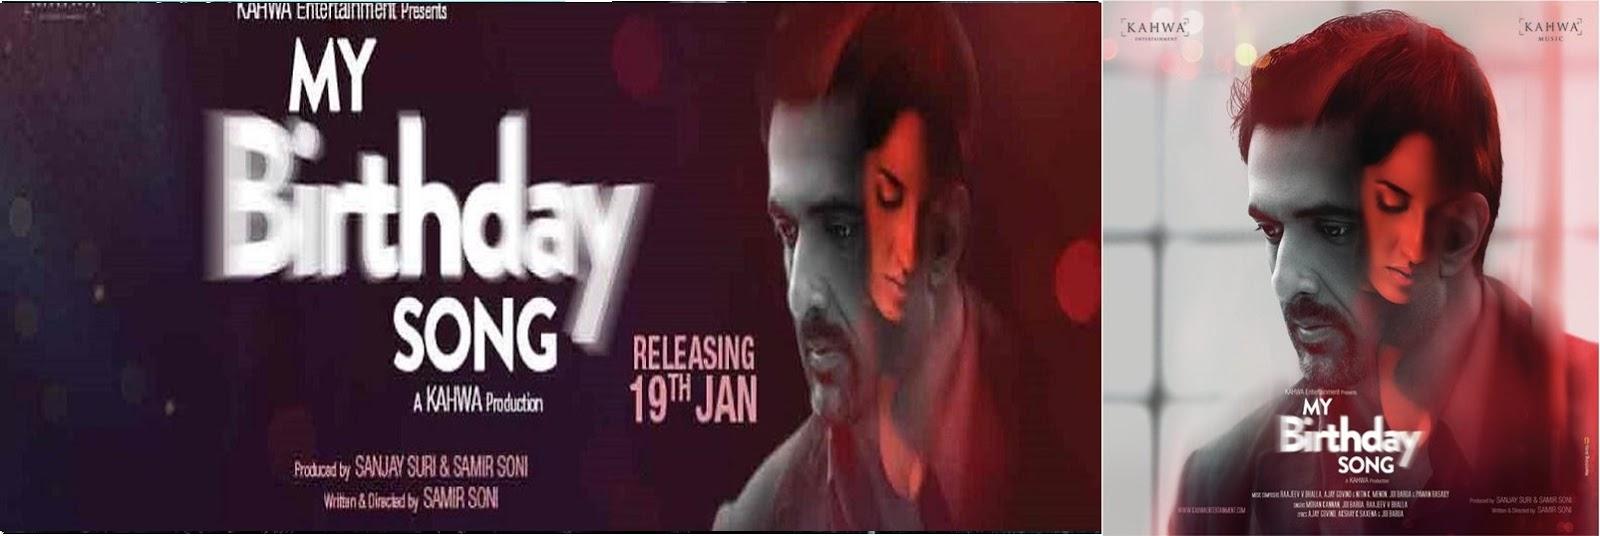 My Birthday Song 2018 Full Movie Hindi 720p – 480p ORG BRRip 300MB - 800MB ESubs Free Download